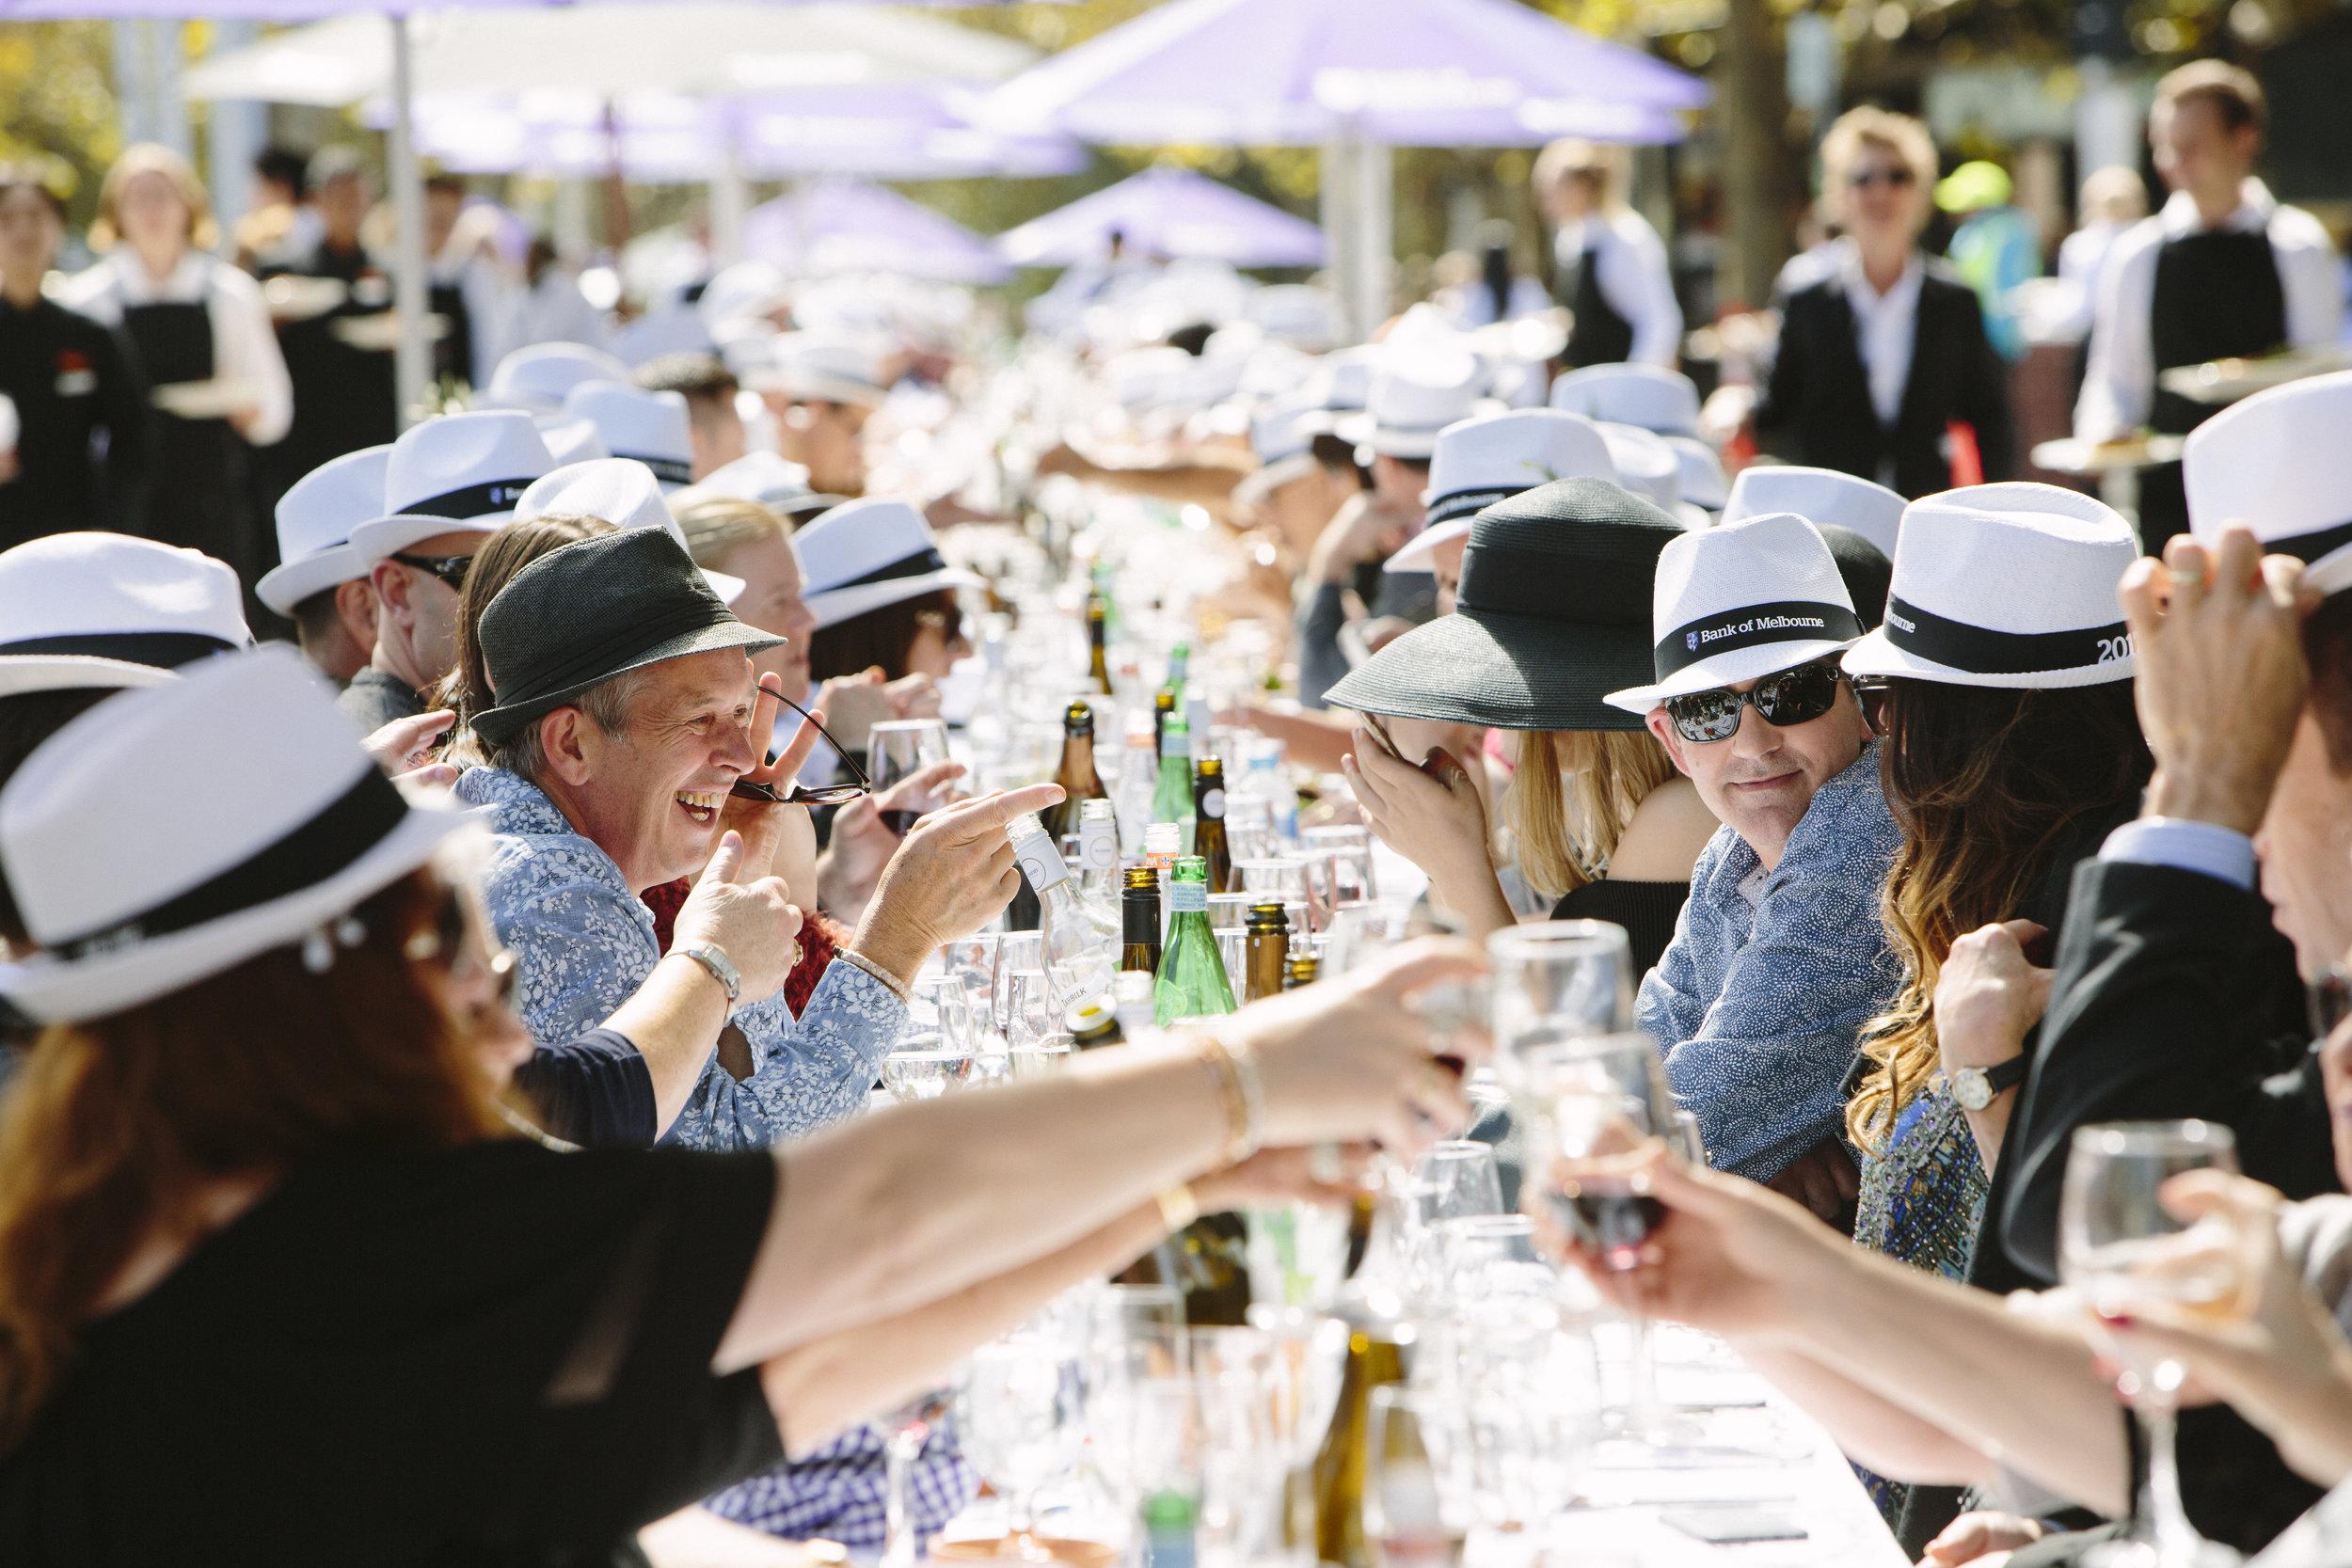 Bank of Melbourne - Melbourne Food and Wine Festival